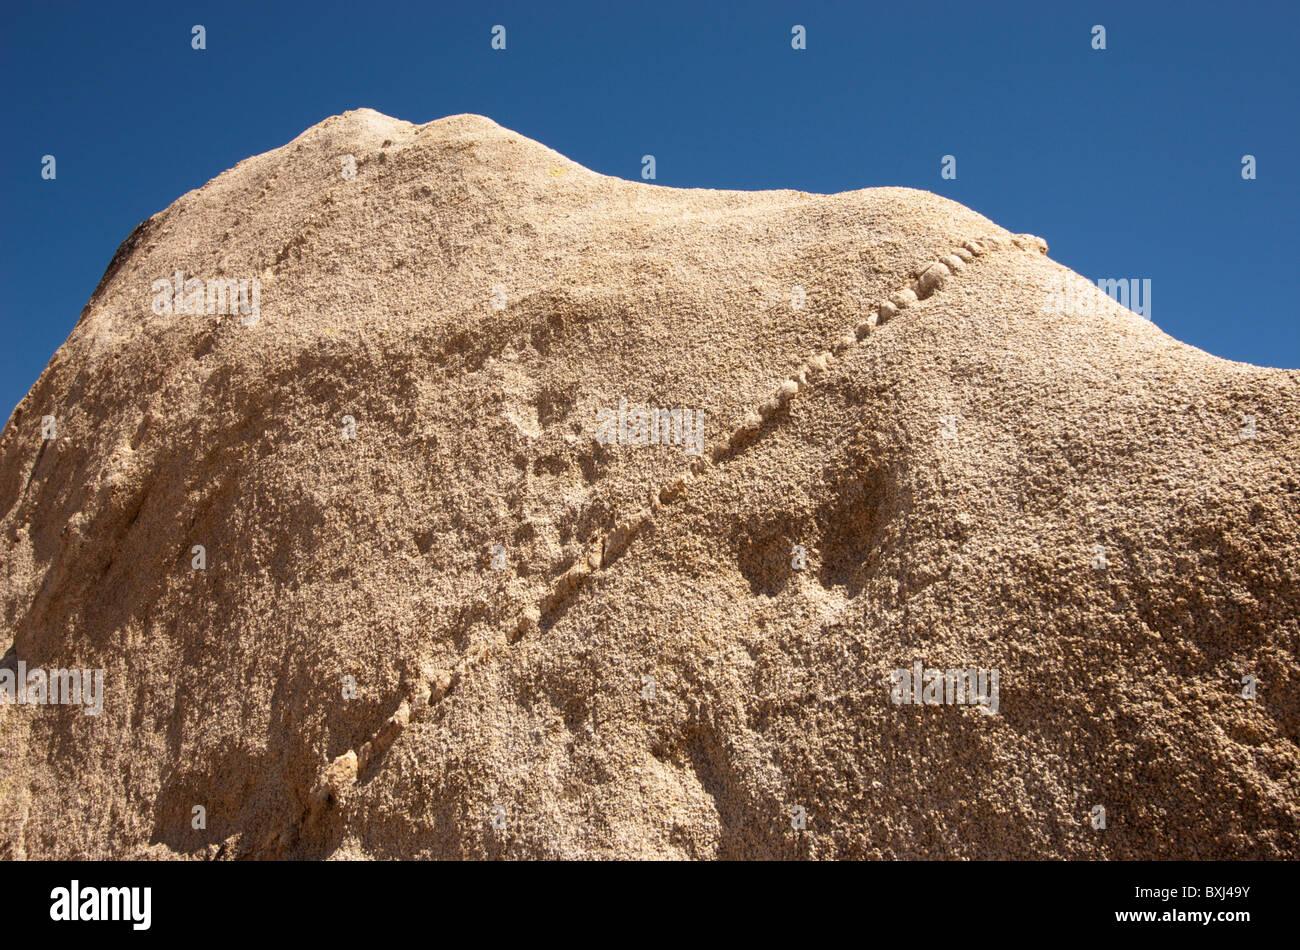 Monzogranite rock Intrusions (dikes) in a monzogranite rock, Joshua Tree National Park, California, USA. - Stock Image